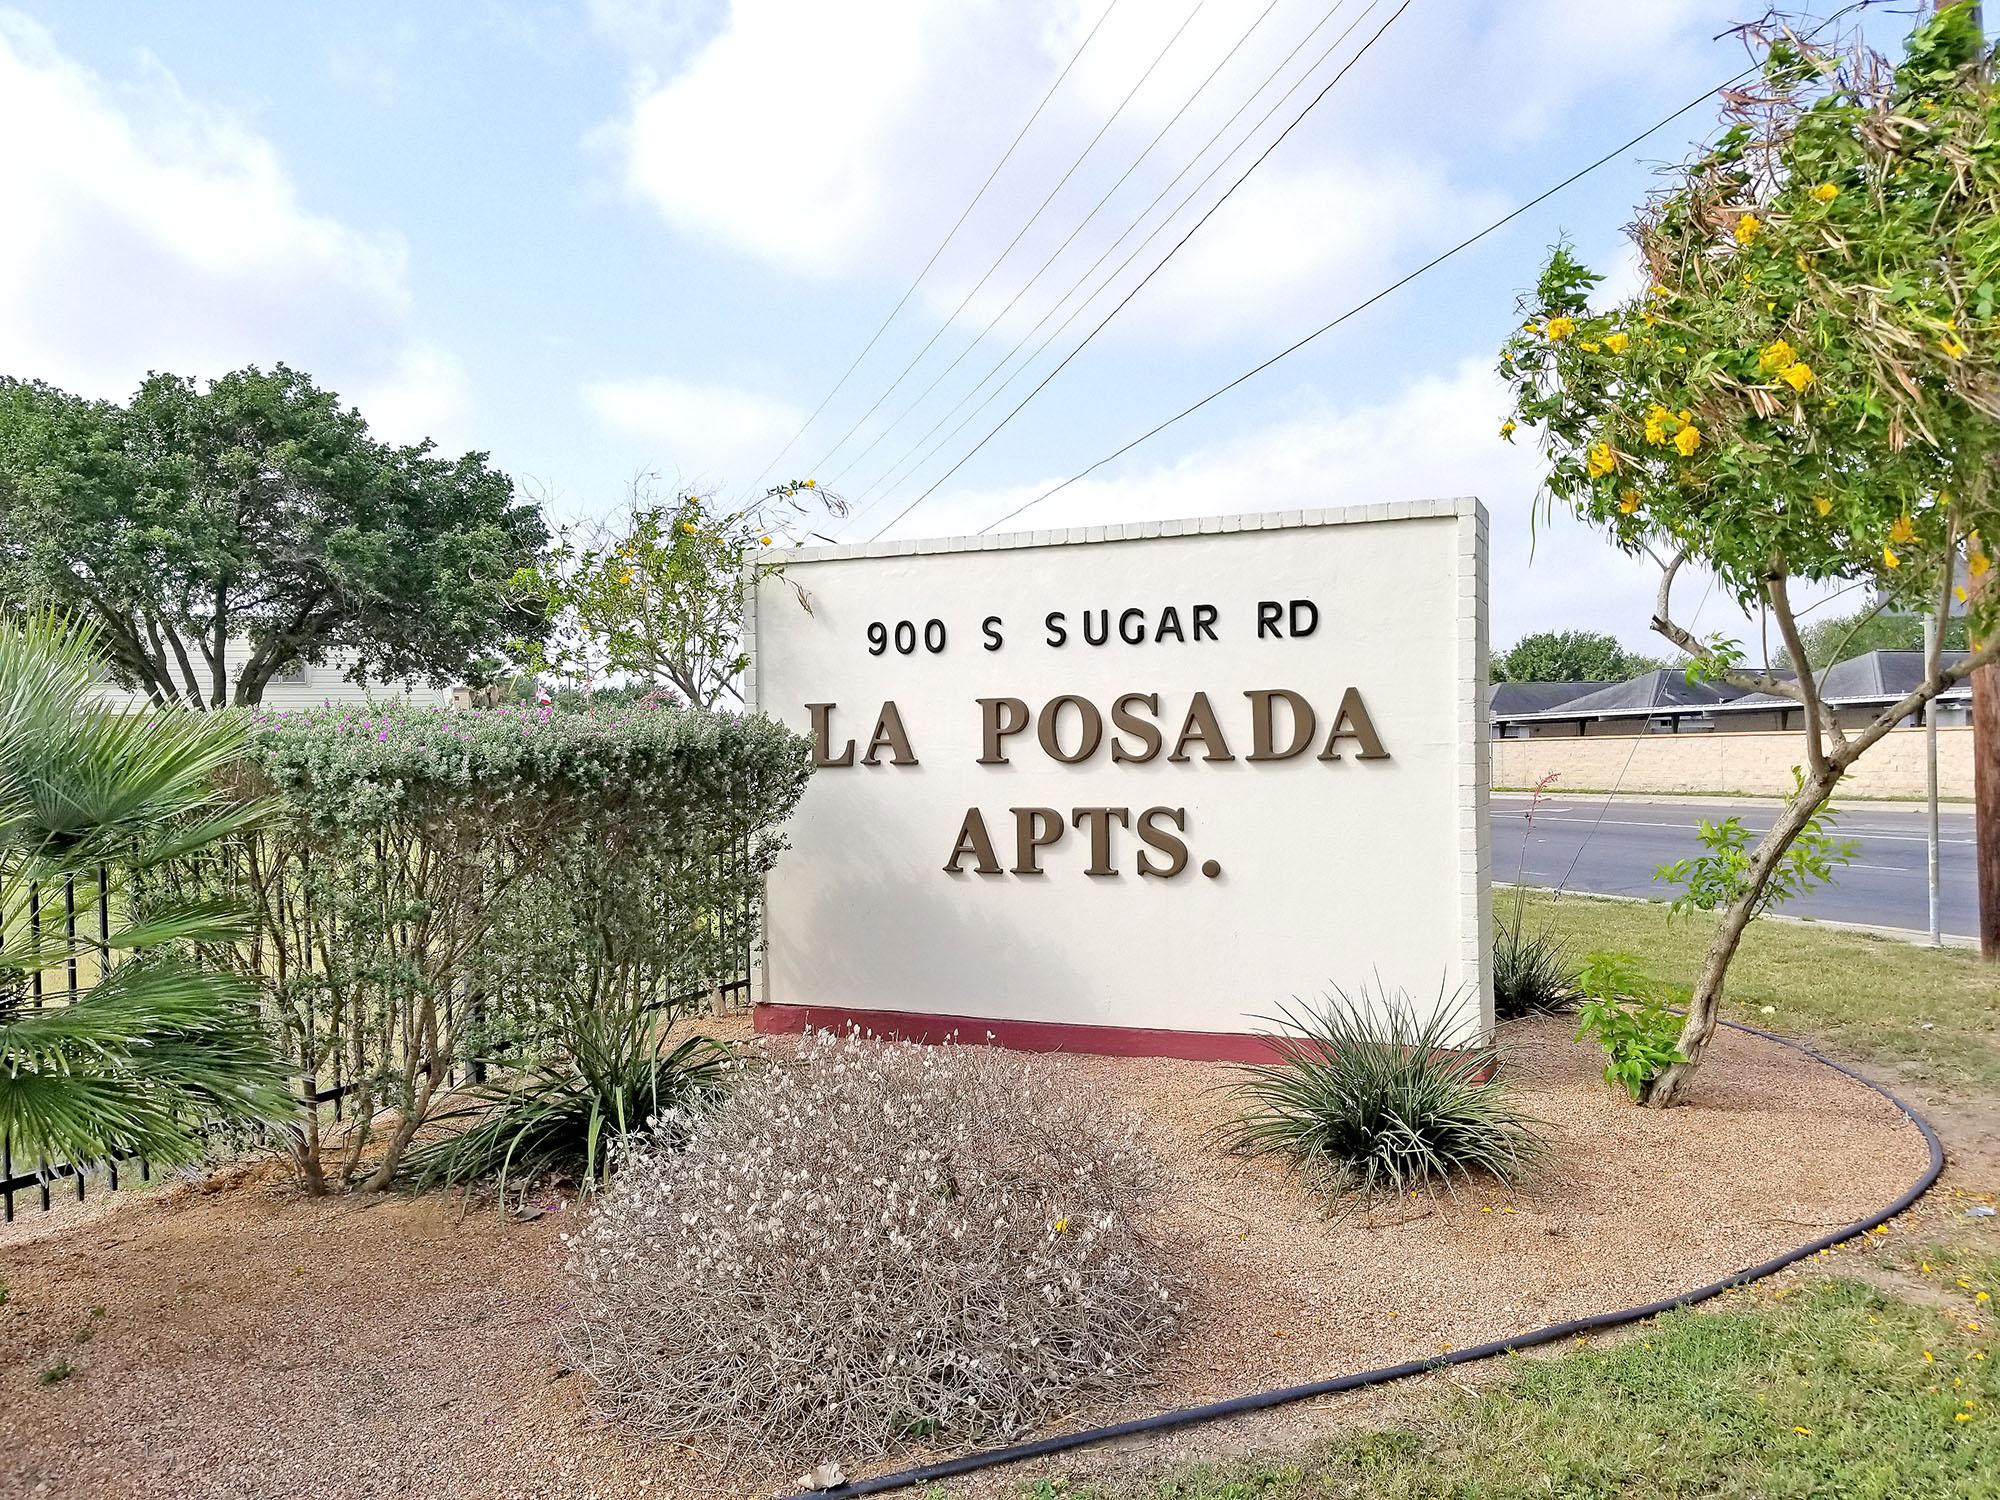 La Posada Apts